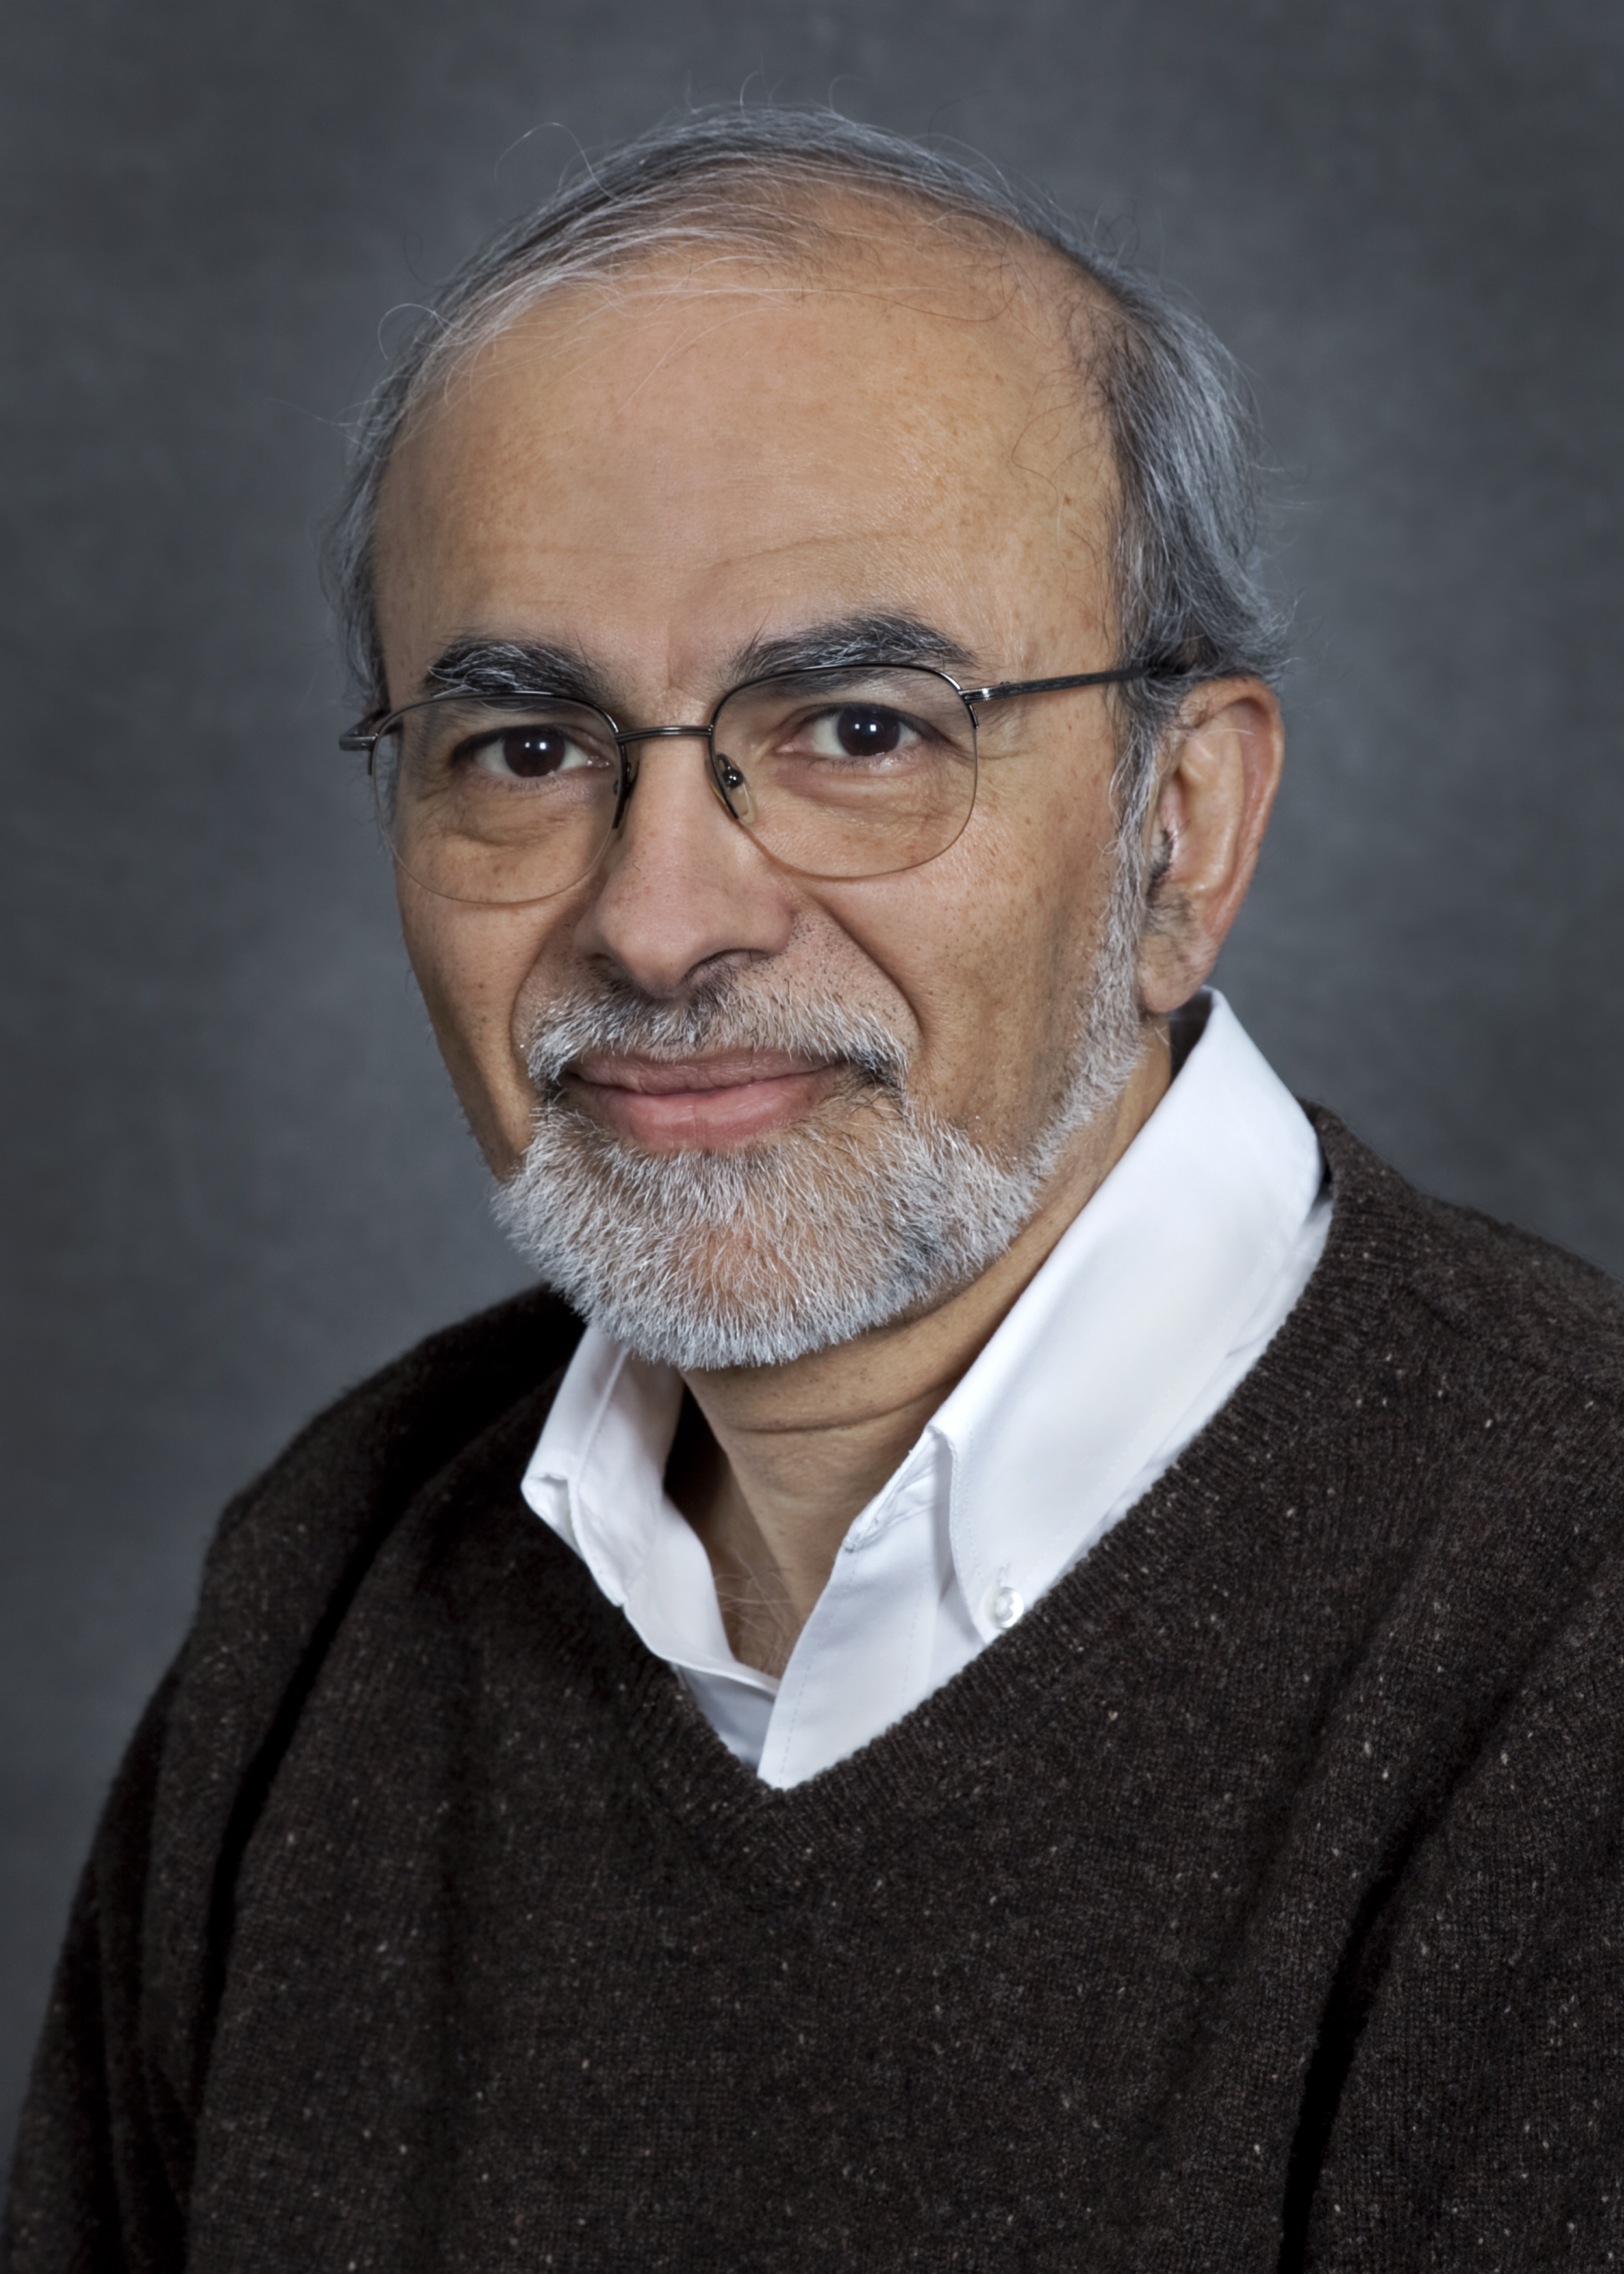 Portrait of Berkeley Lab senior scientist Jayant Sathaye